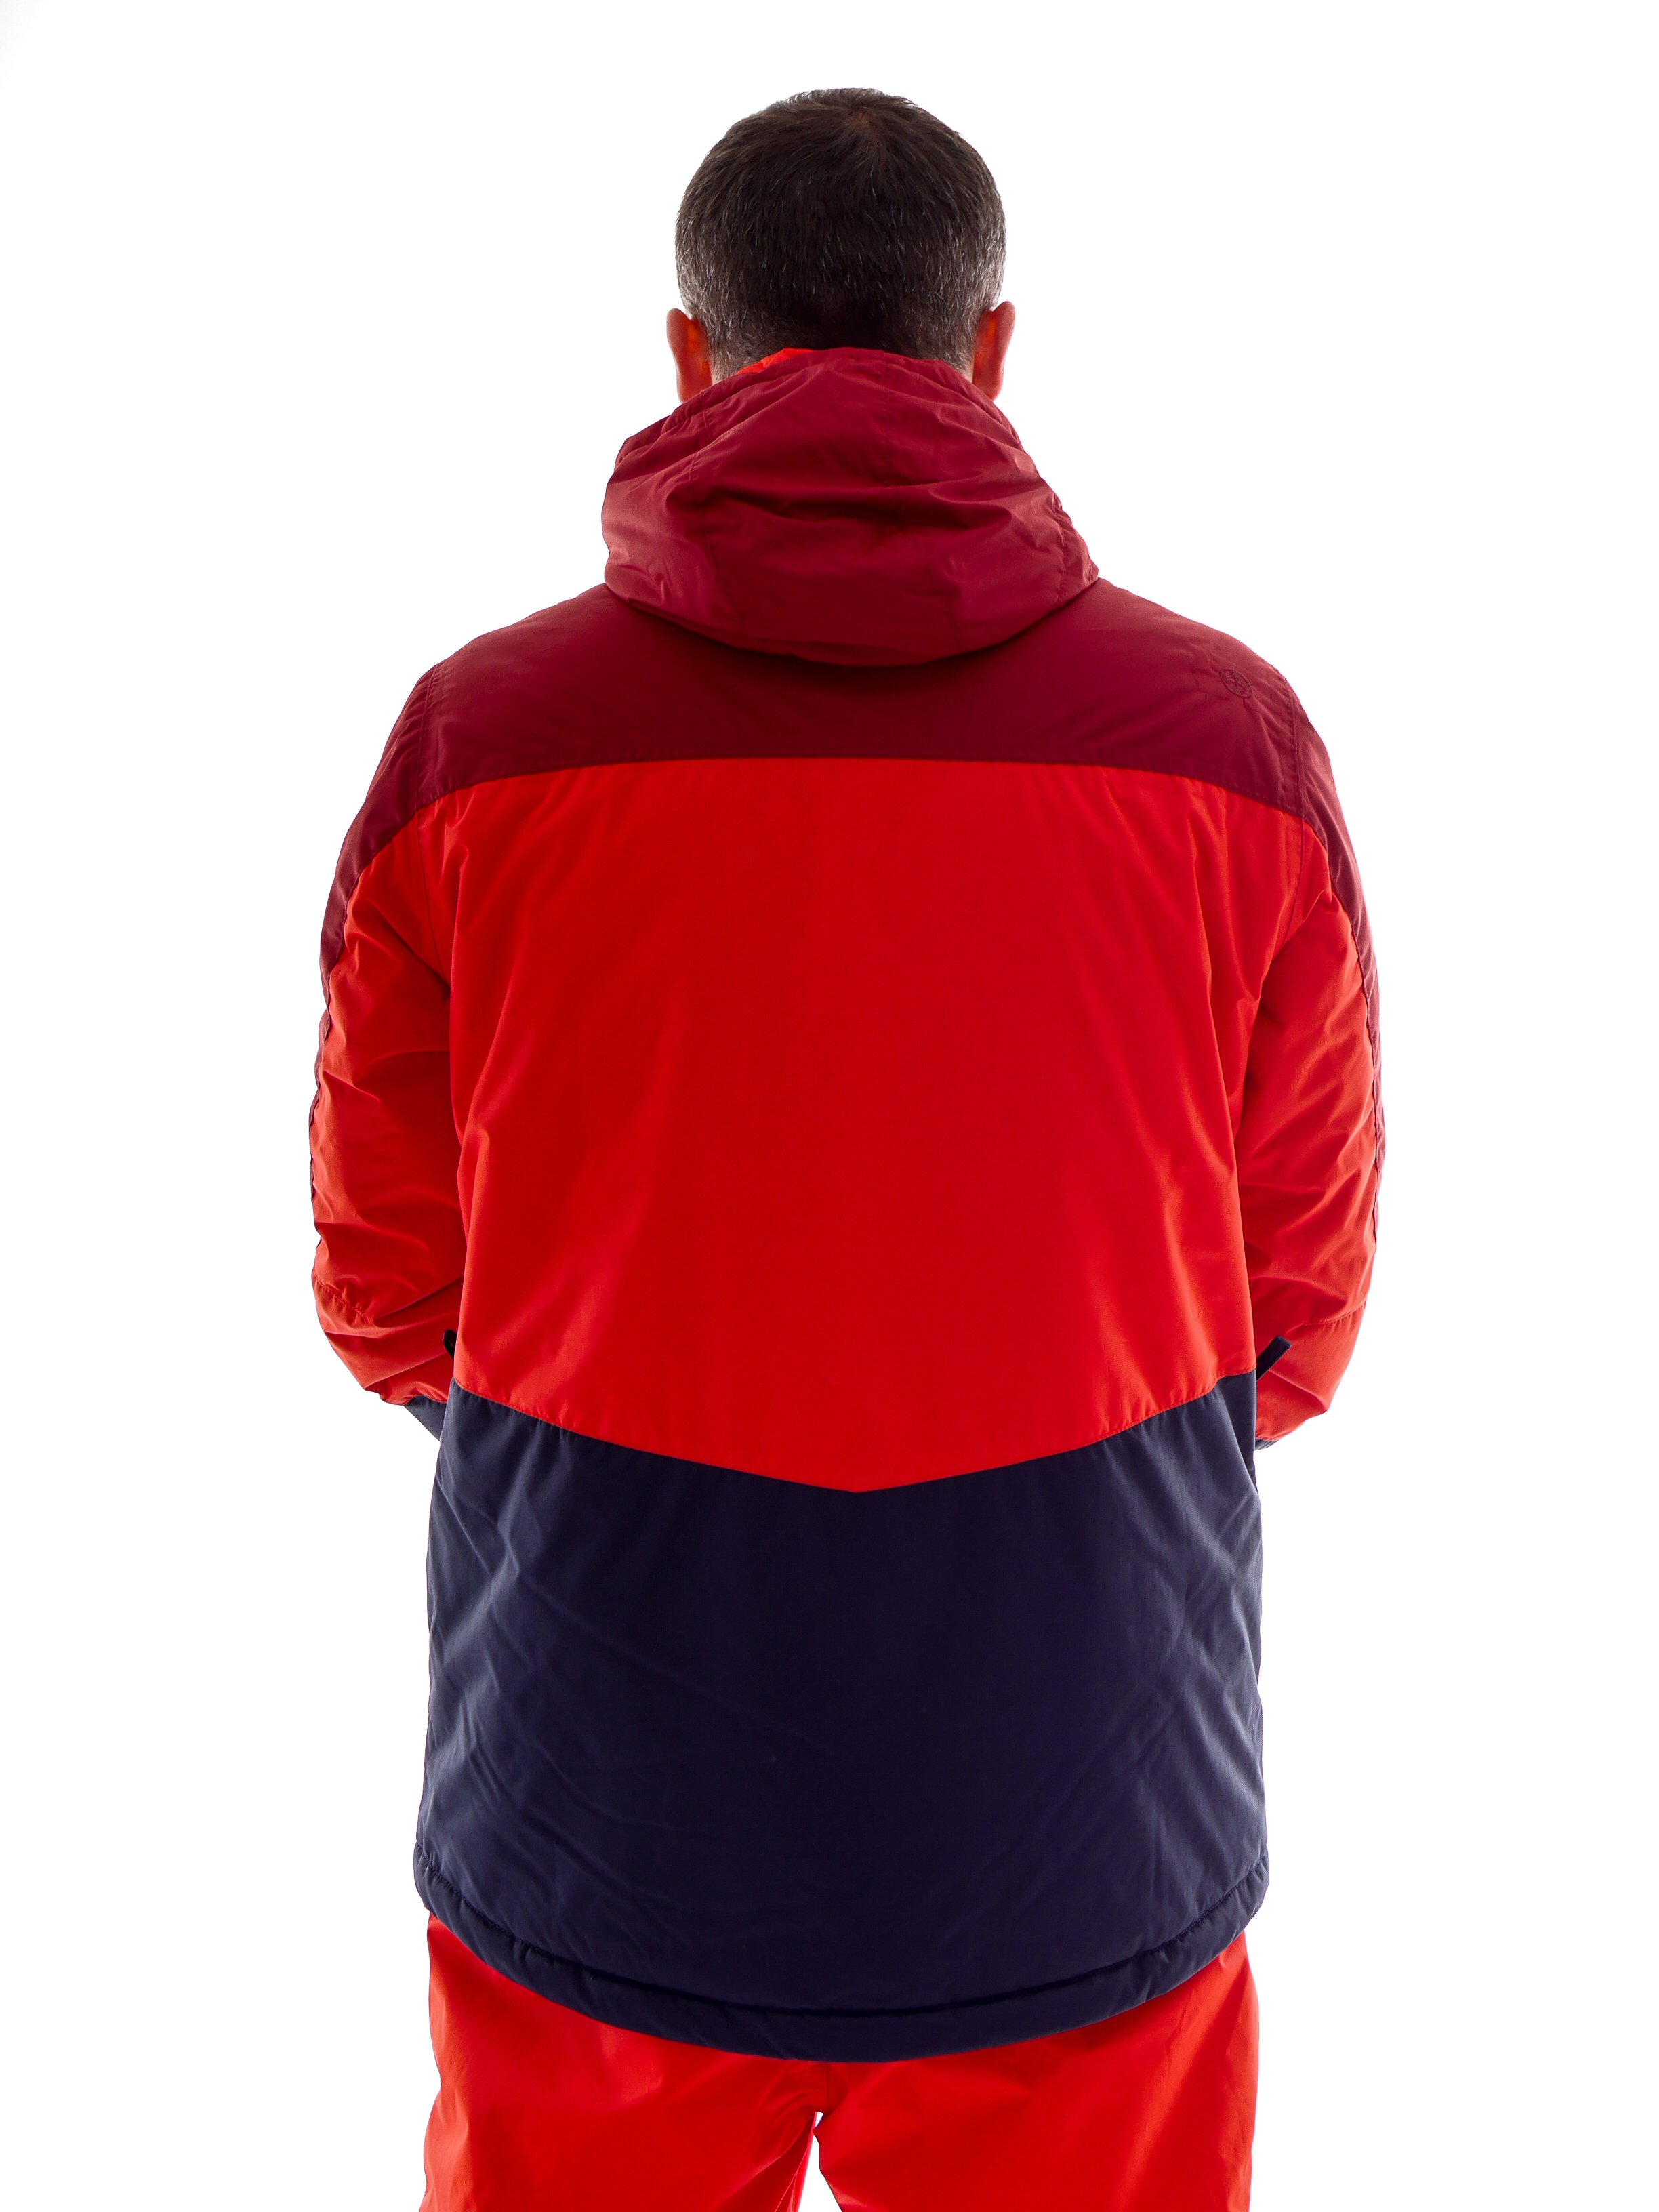 Brunotti Ski Jacket Snowboard Jacket Muiel red 5K waterproof Snow